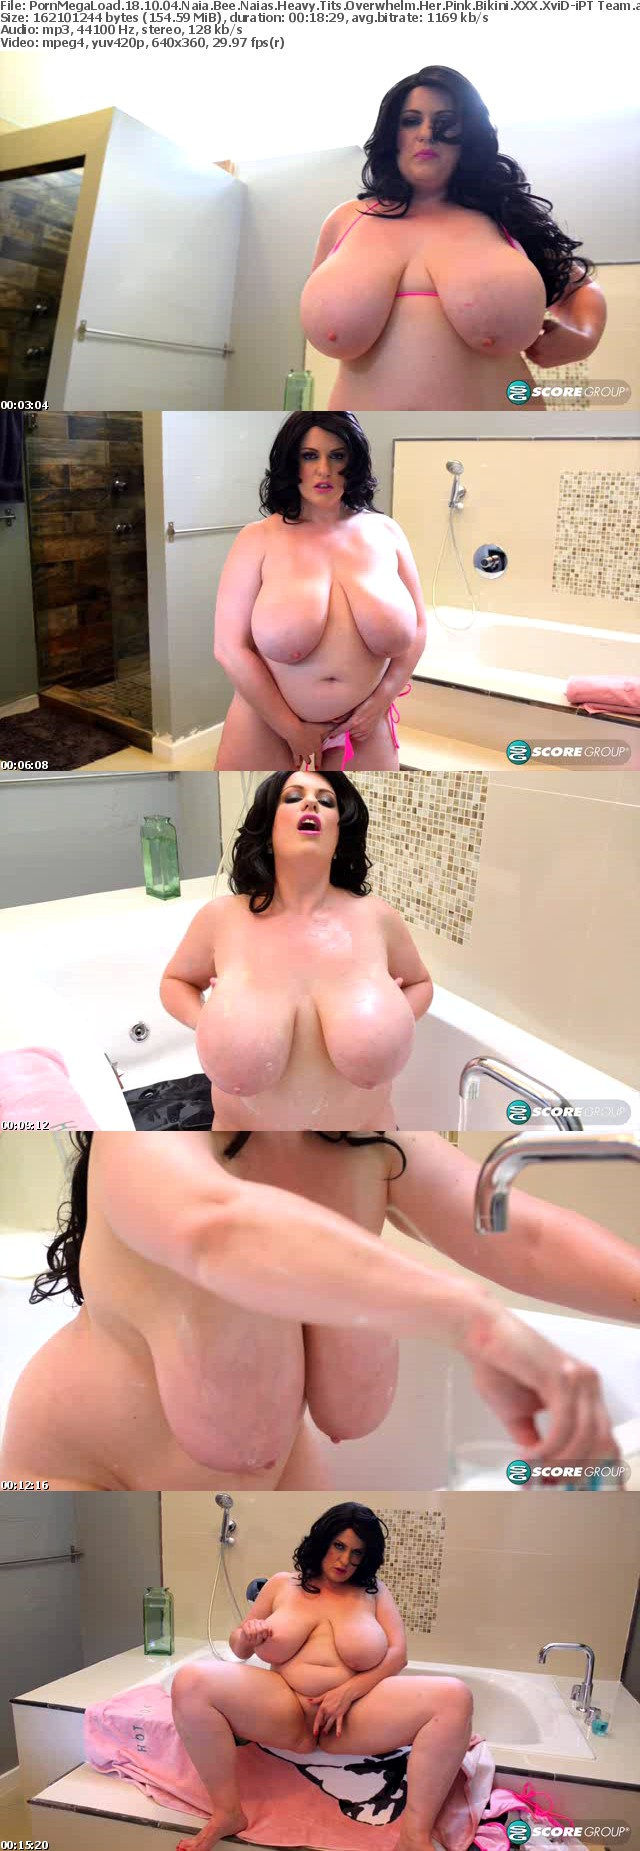 PornMegaLoad 18 10 04 Naia Bee Naias Heavy Tits Overwhelm Her Pink Bikini XXX